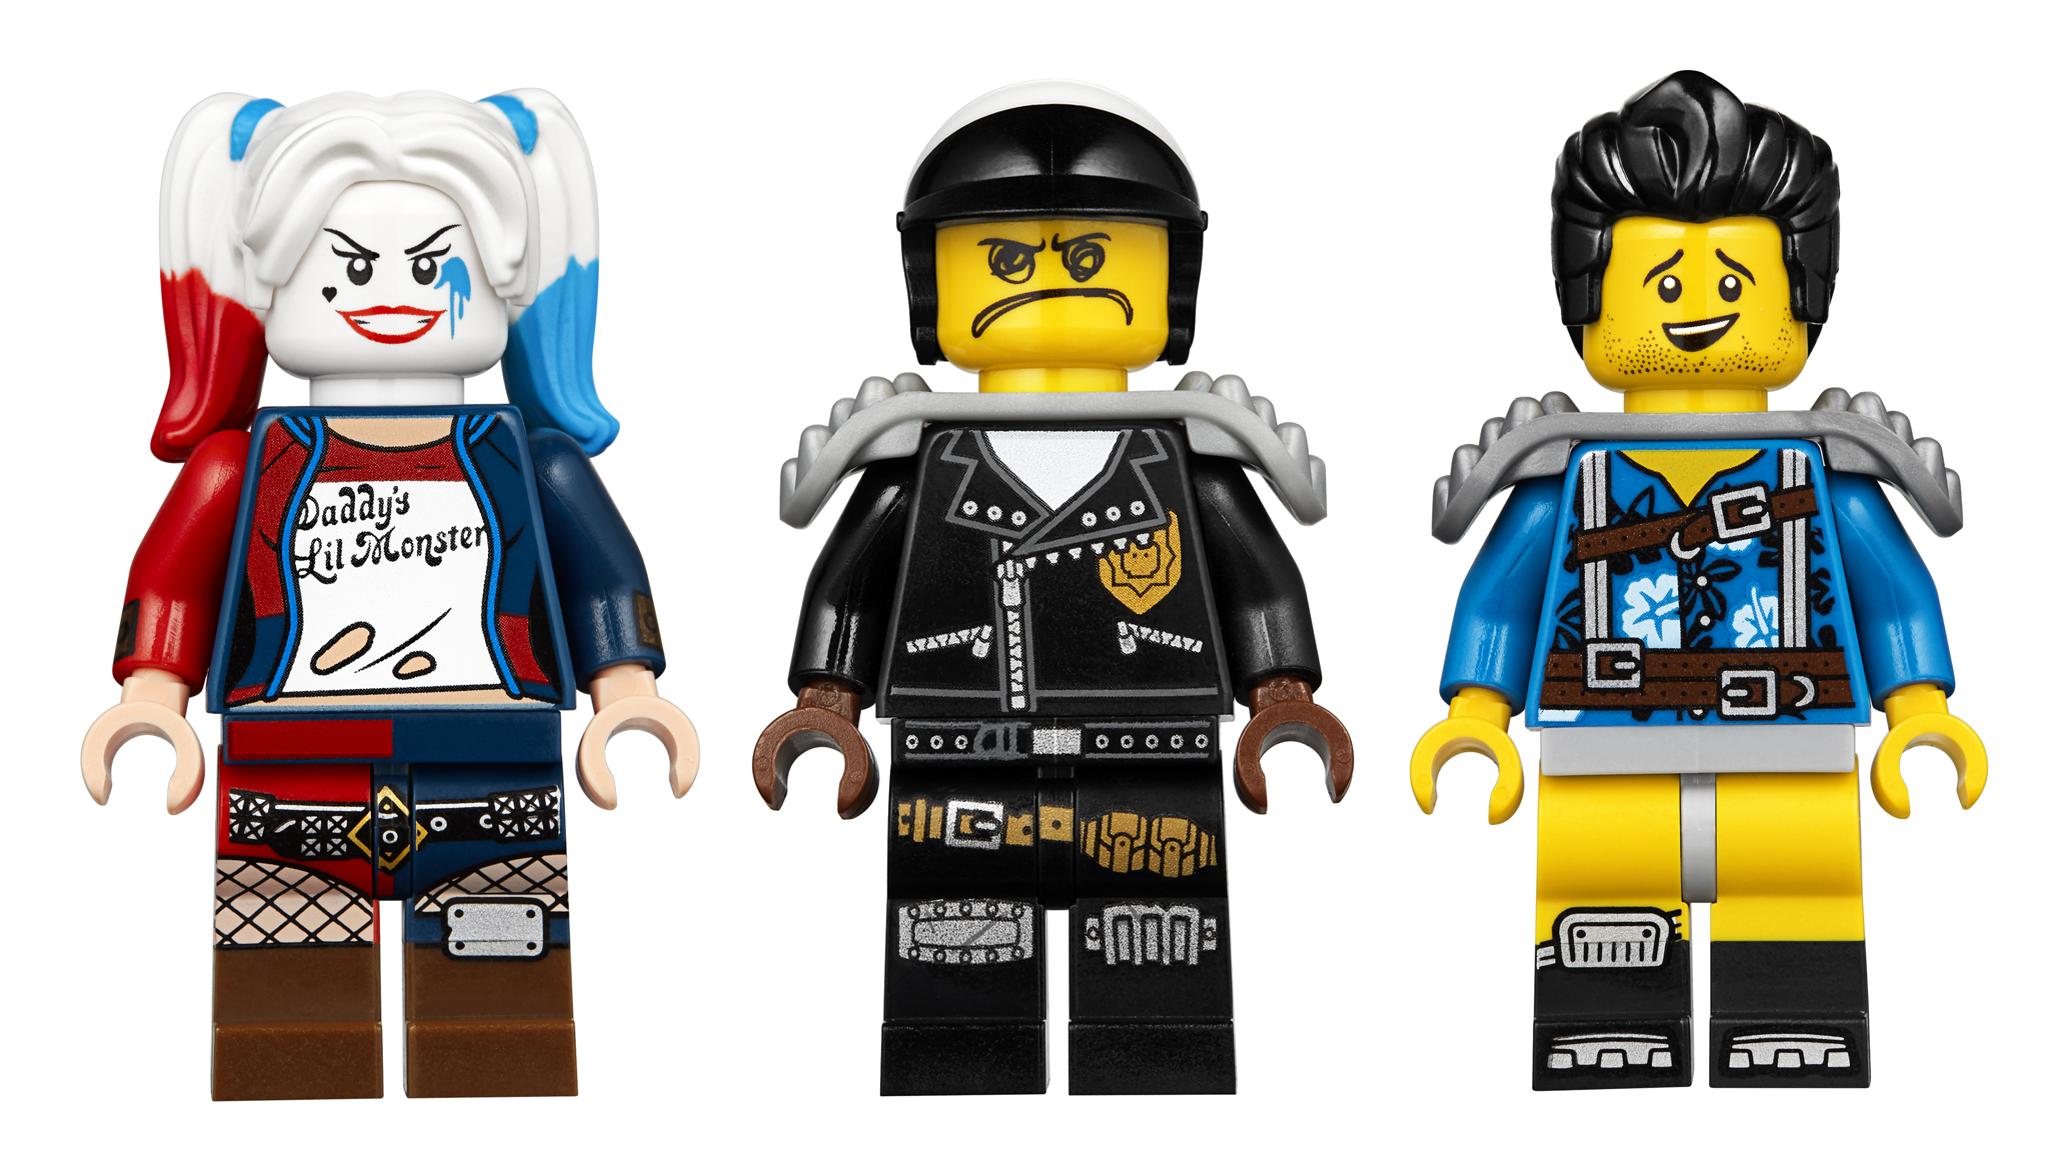 Lego 20 x Griff 48729 mechanische Hand neu dunkelgrau  NEU